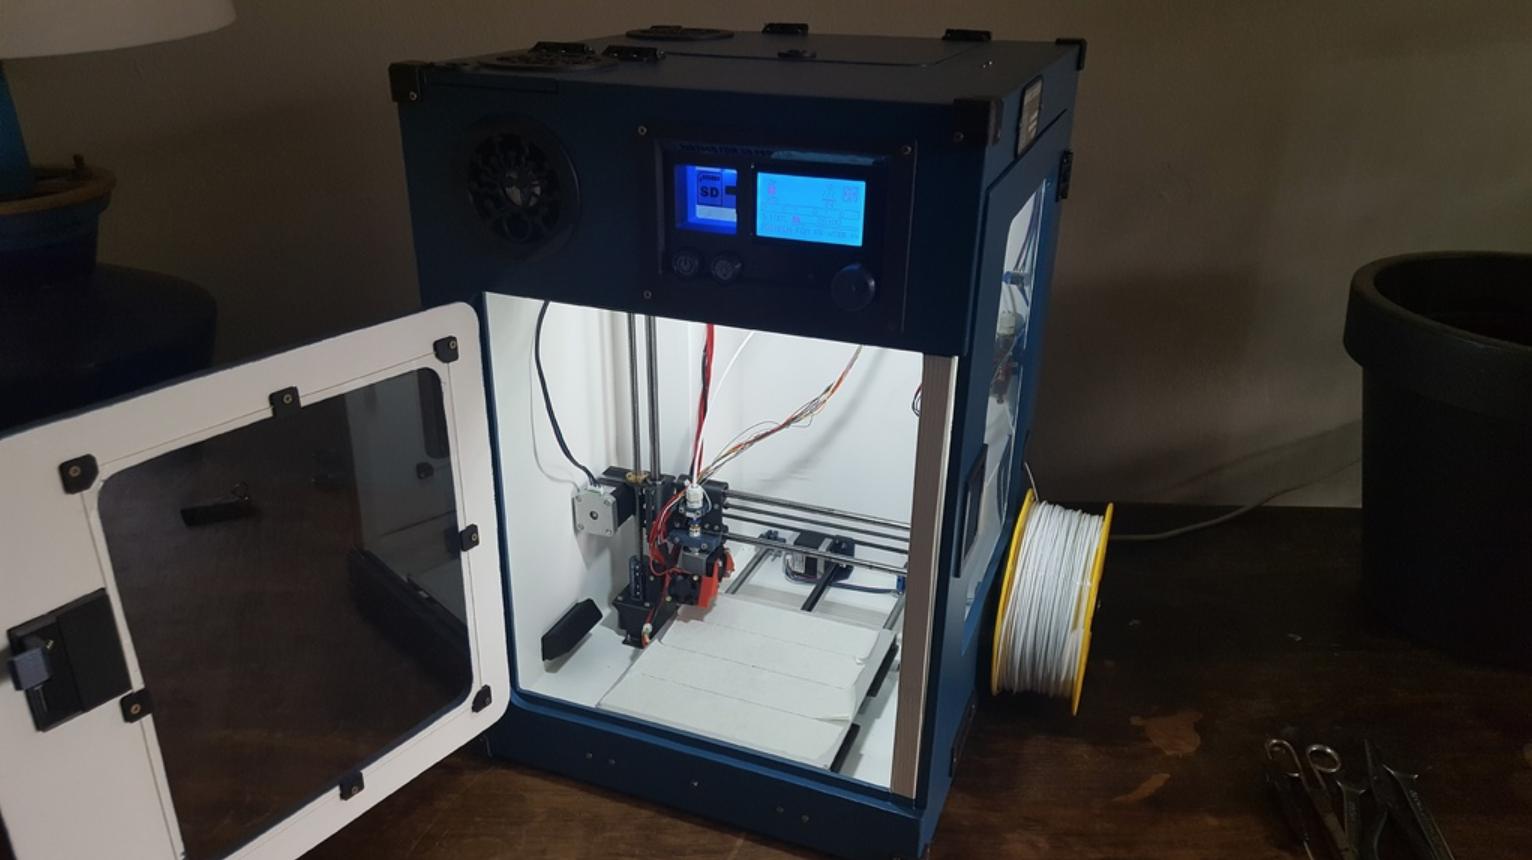 Capture d'écran 2018-02-01 à 10.27.54.png Download free STL file Portable 3D Printer • 3D printable design, Job